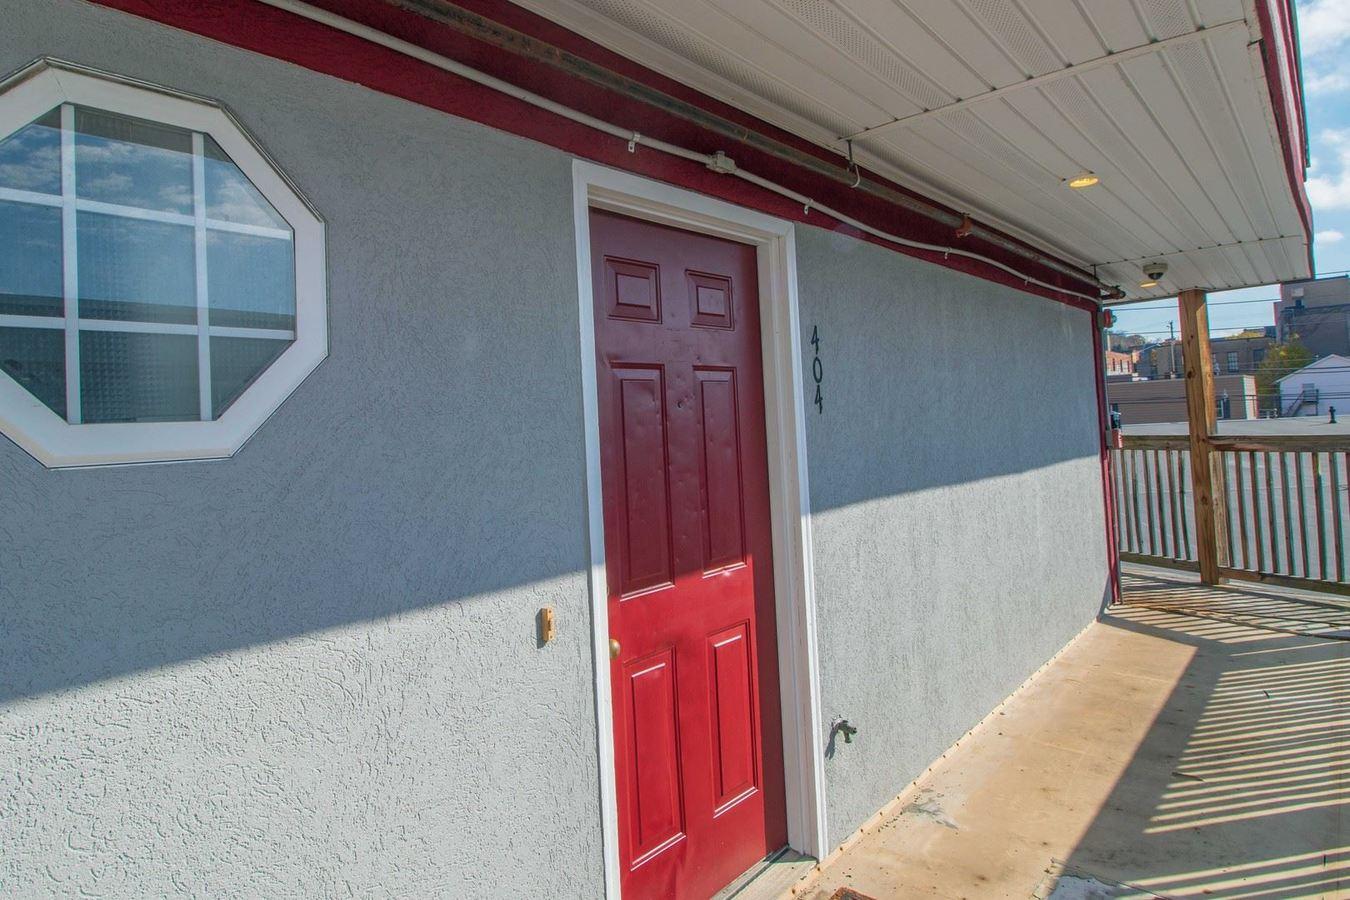 3 Bedrooms 1 Bathroom Apartment for rent at 1993 Water Street in Morgantown, WV